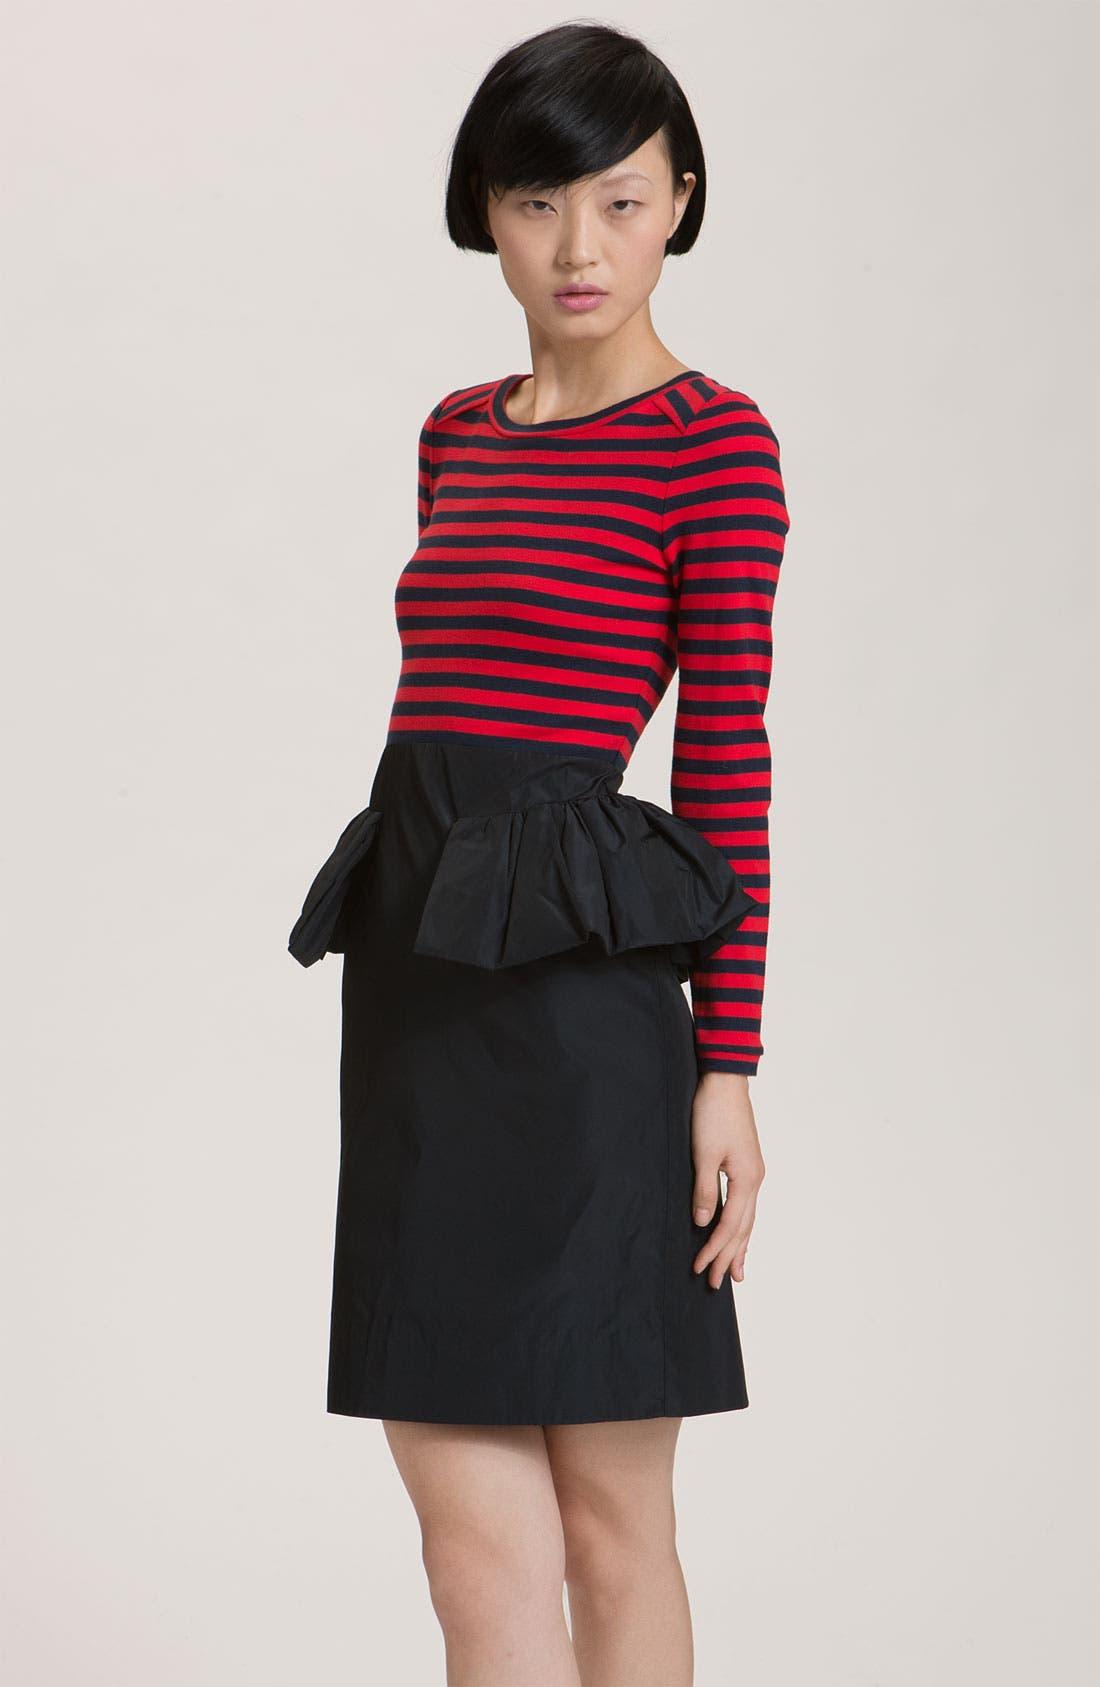 Alternate Image 1 Selected - MARC BY MARC JACOBS 'Ellsworth' Striped Peplum Dress